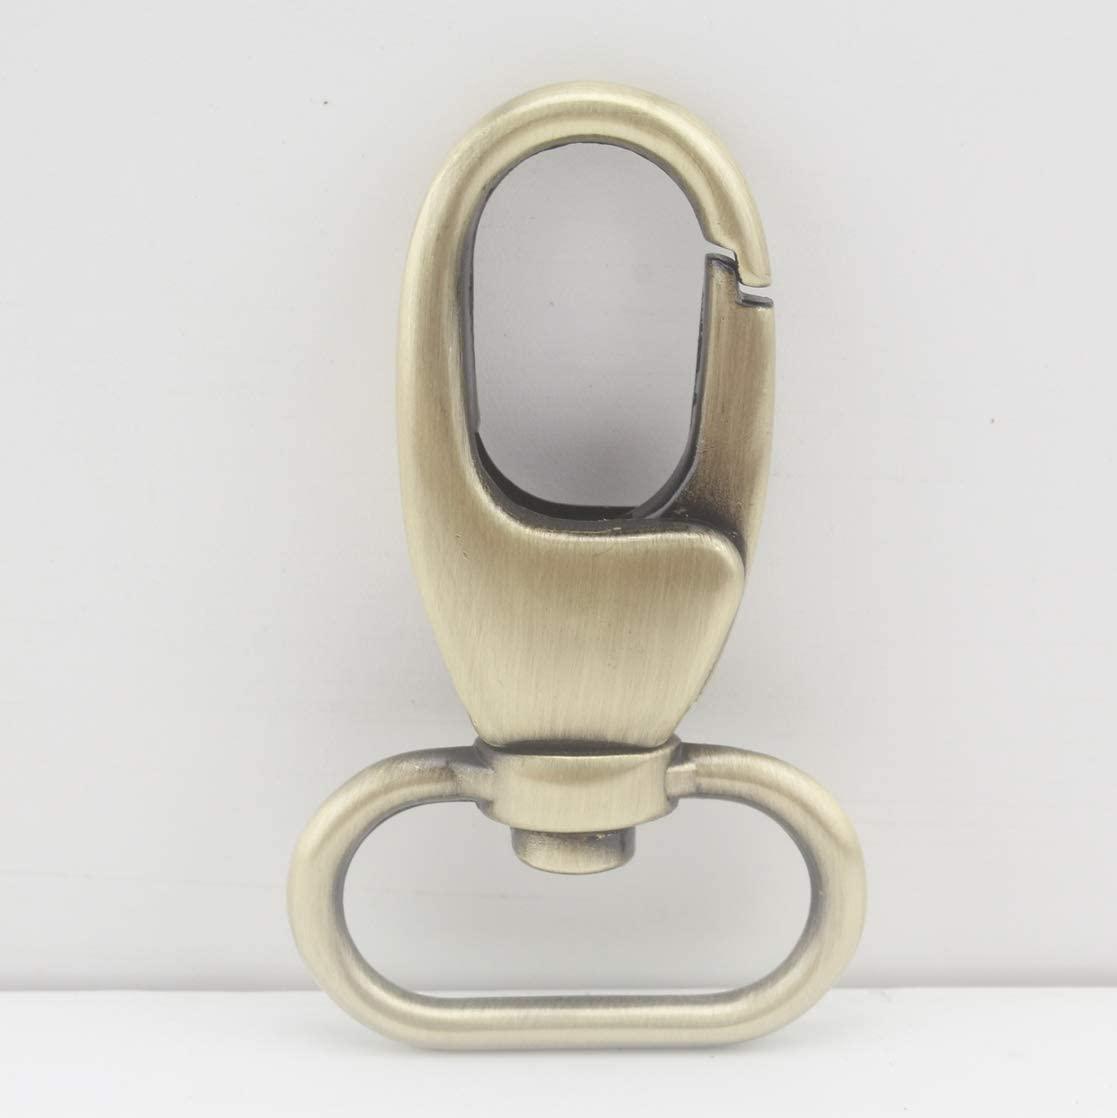 Anti Bronze, 1 inch / 25mm Zinc Alloy Purse Hook Push gate snap Hook for Strap Handbag Purse Bag Key Ring DIY Craft, 6 Pieces per lot, AC110